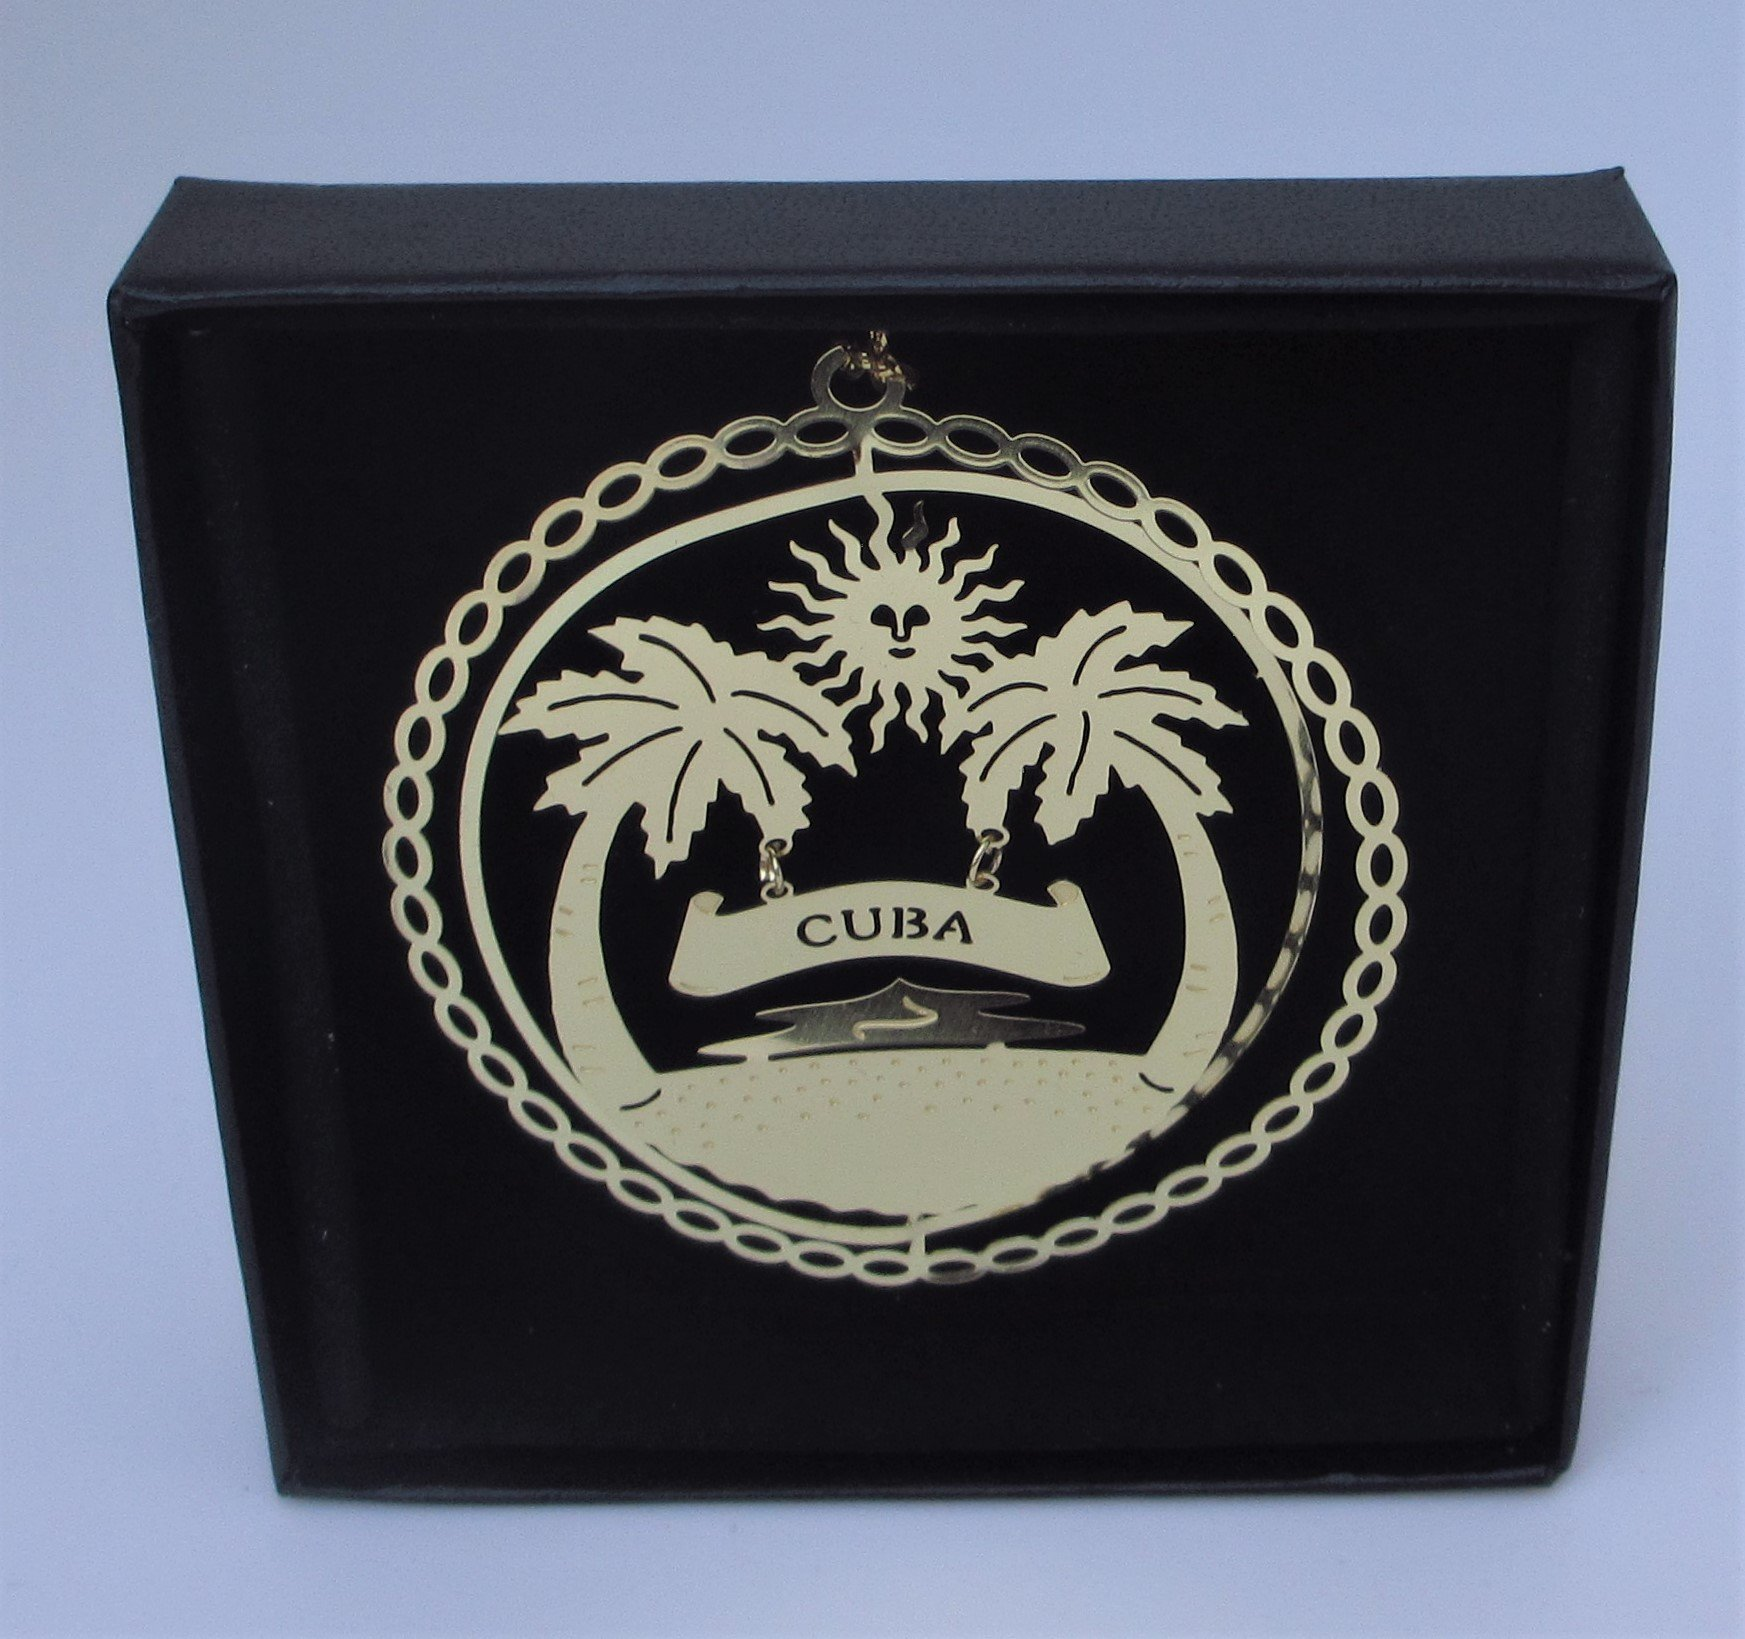 Cuba Brass Ornament Black Leatherette Gift Box